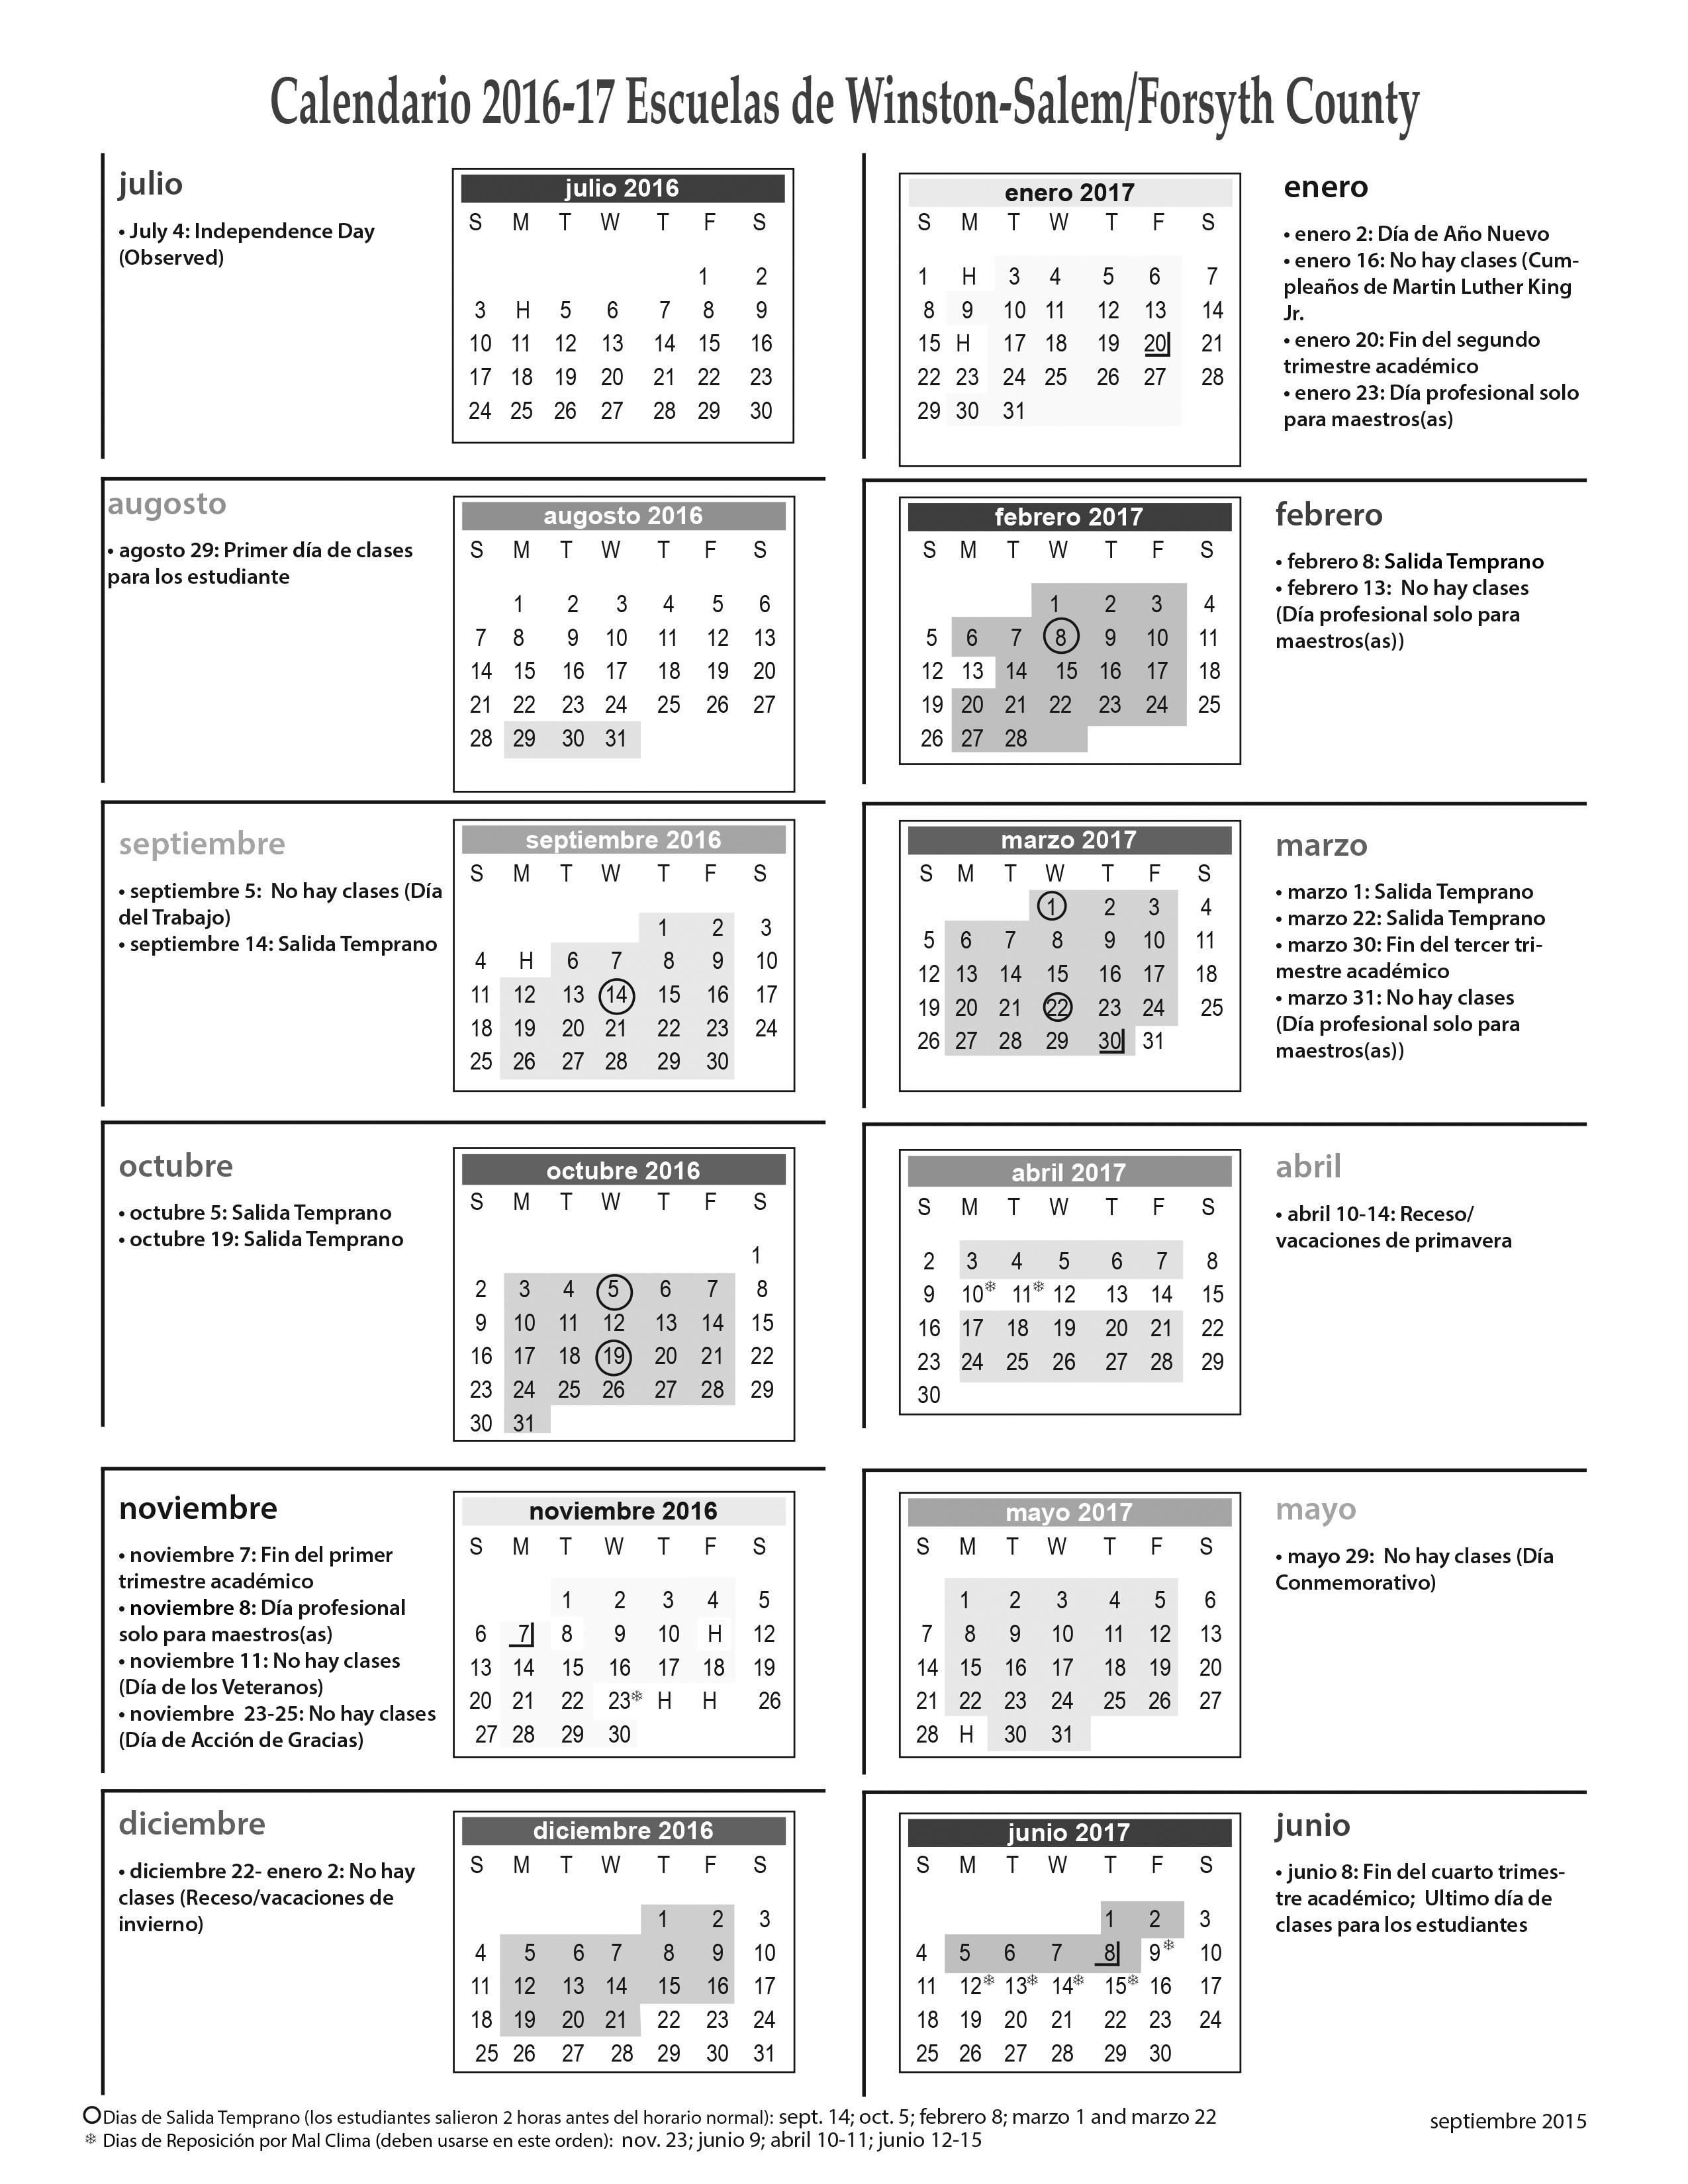 Wsfcs Calendar 2016 2020 Wsfcs Calendar | 2020 Calendar